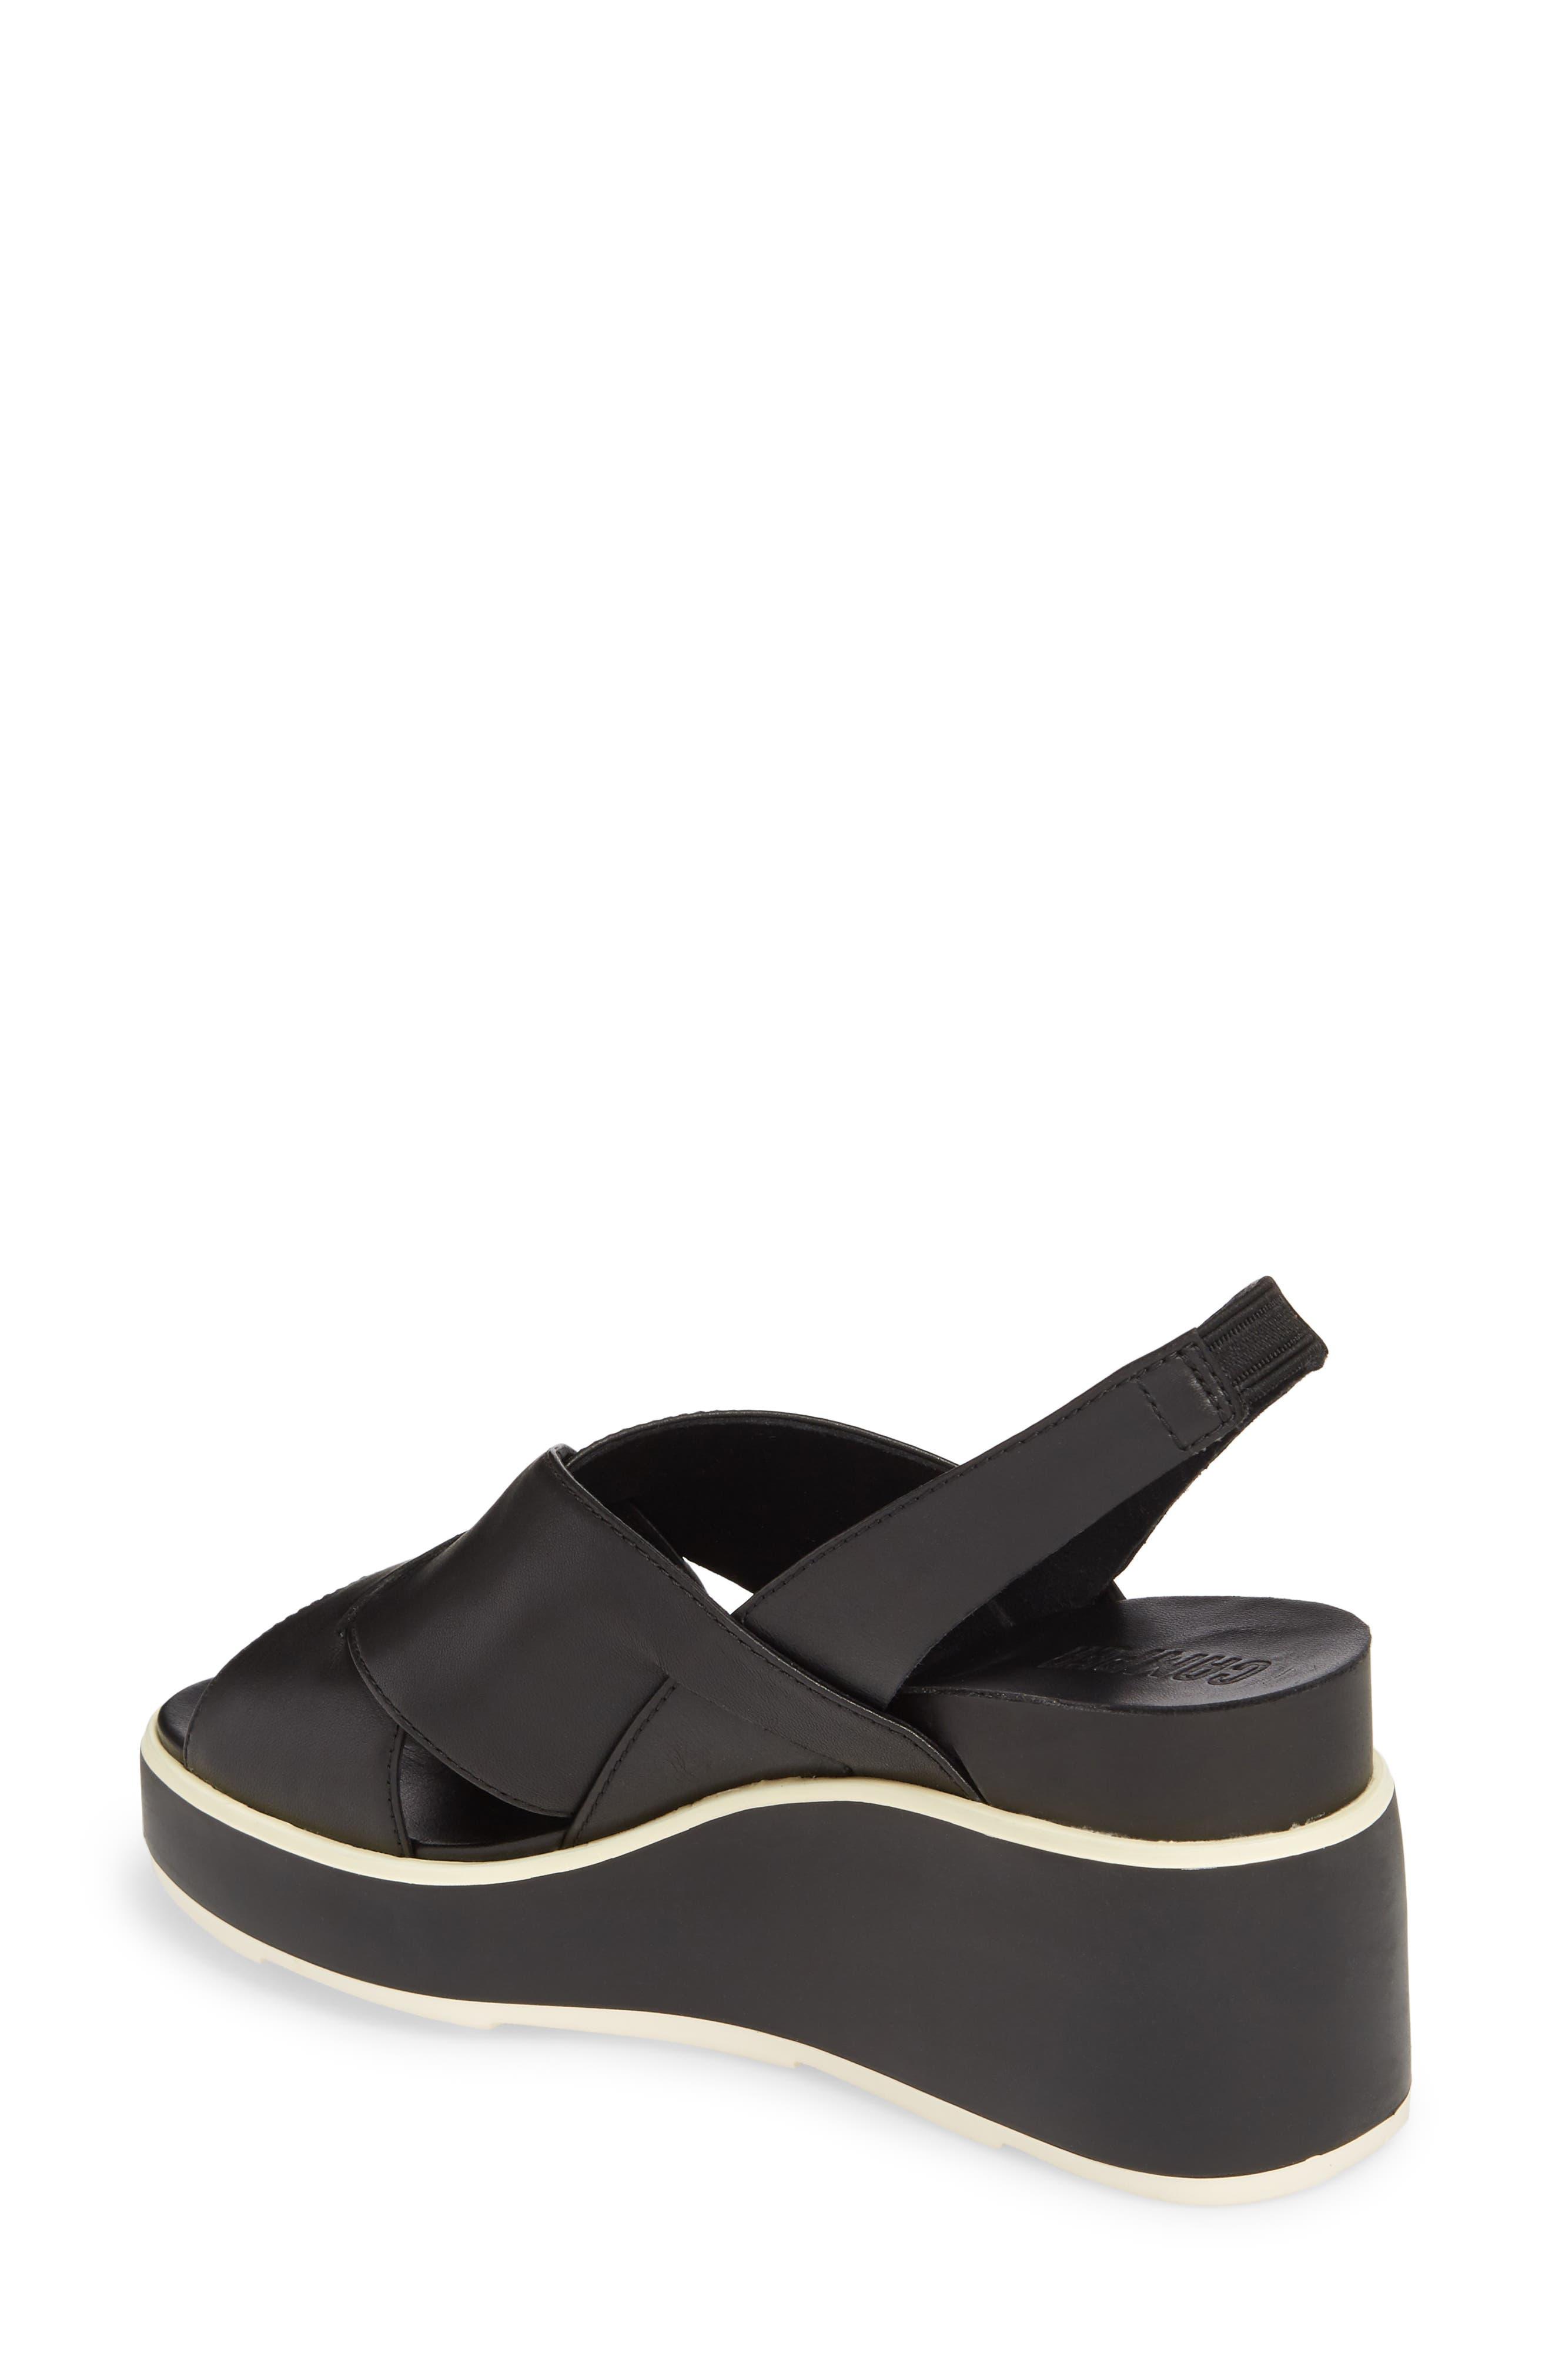 Tropik Cross Strap Wedge Sandal,                             Alternate thumbnail 2, color,                             BLACK LEATHER